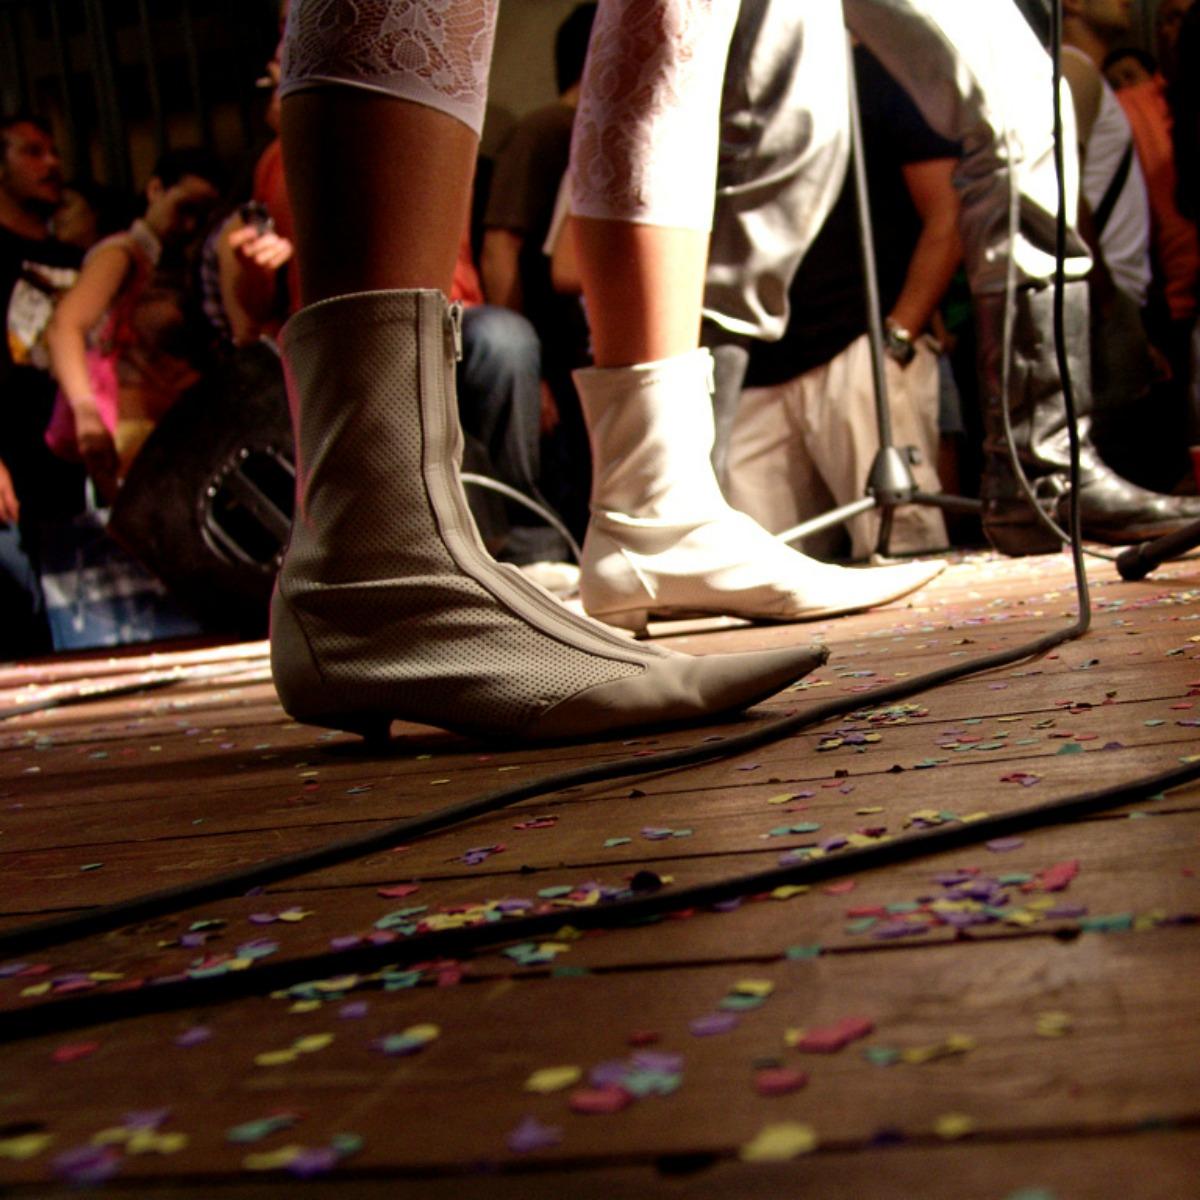 NEWS ROUNDUP: The Beastie Boys, Radiohead, & Brooklyn Weekend Events